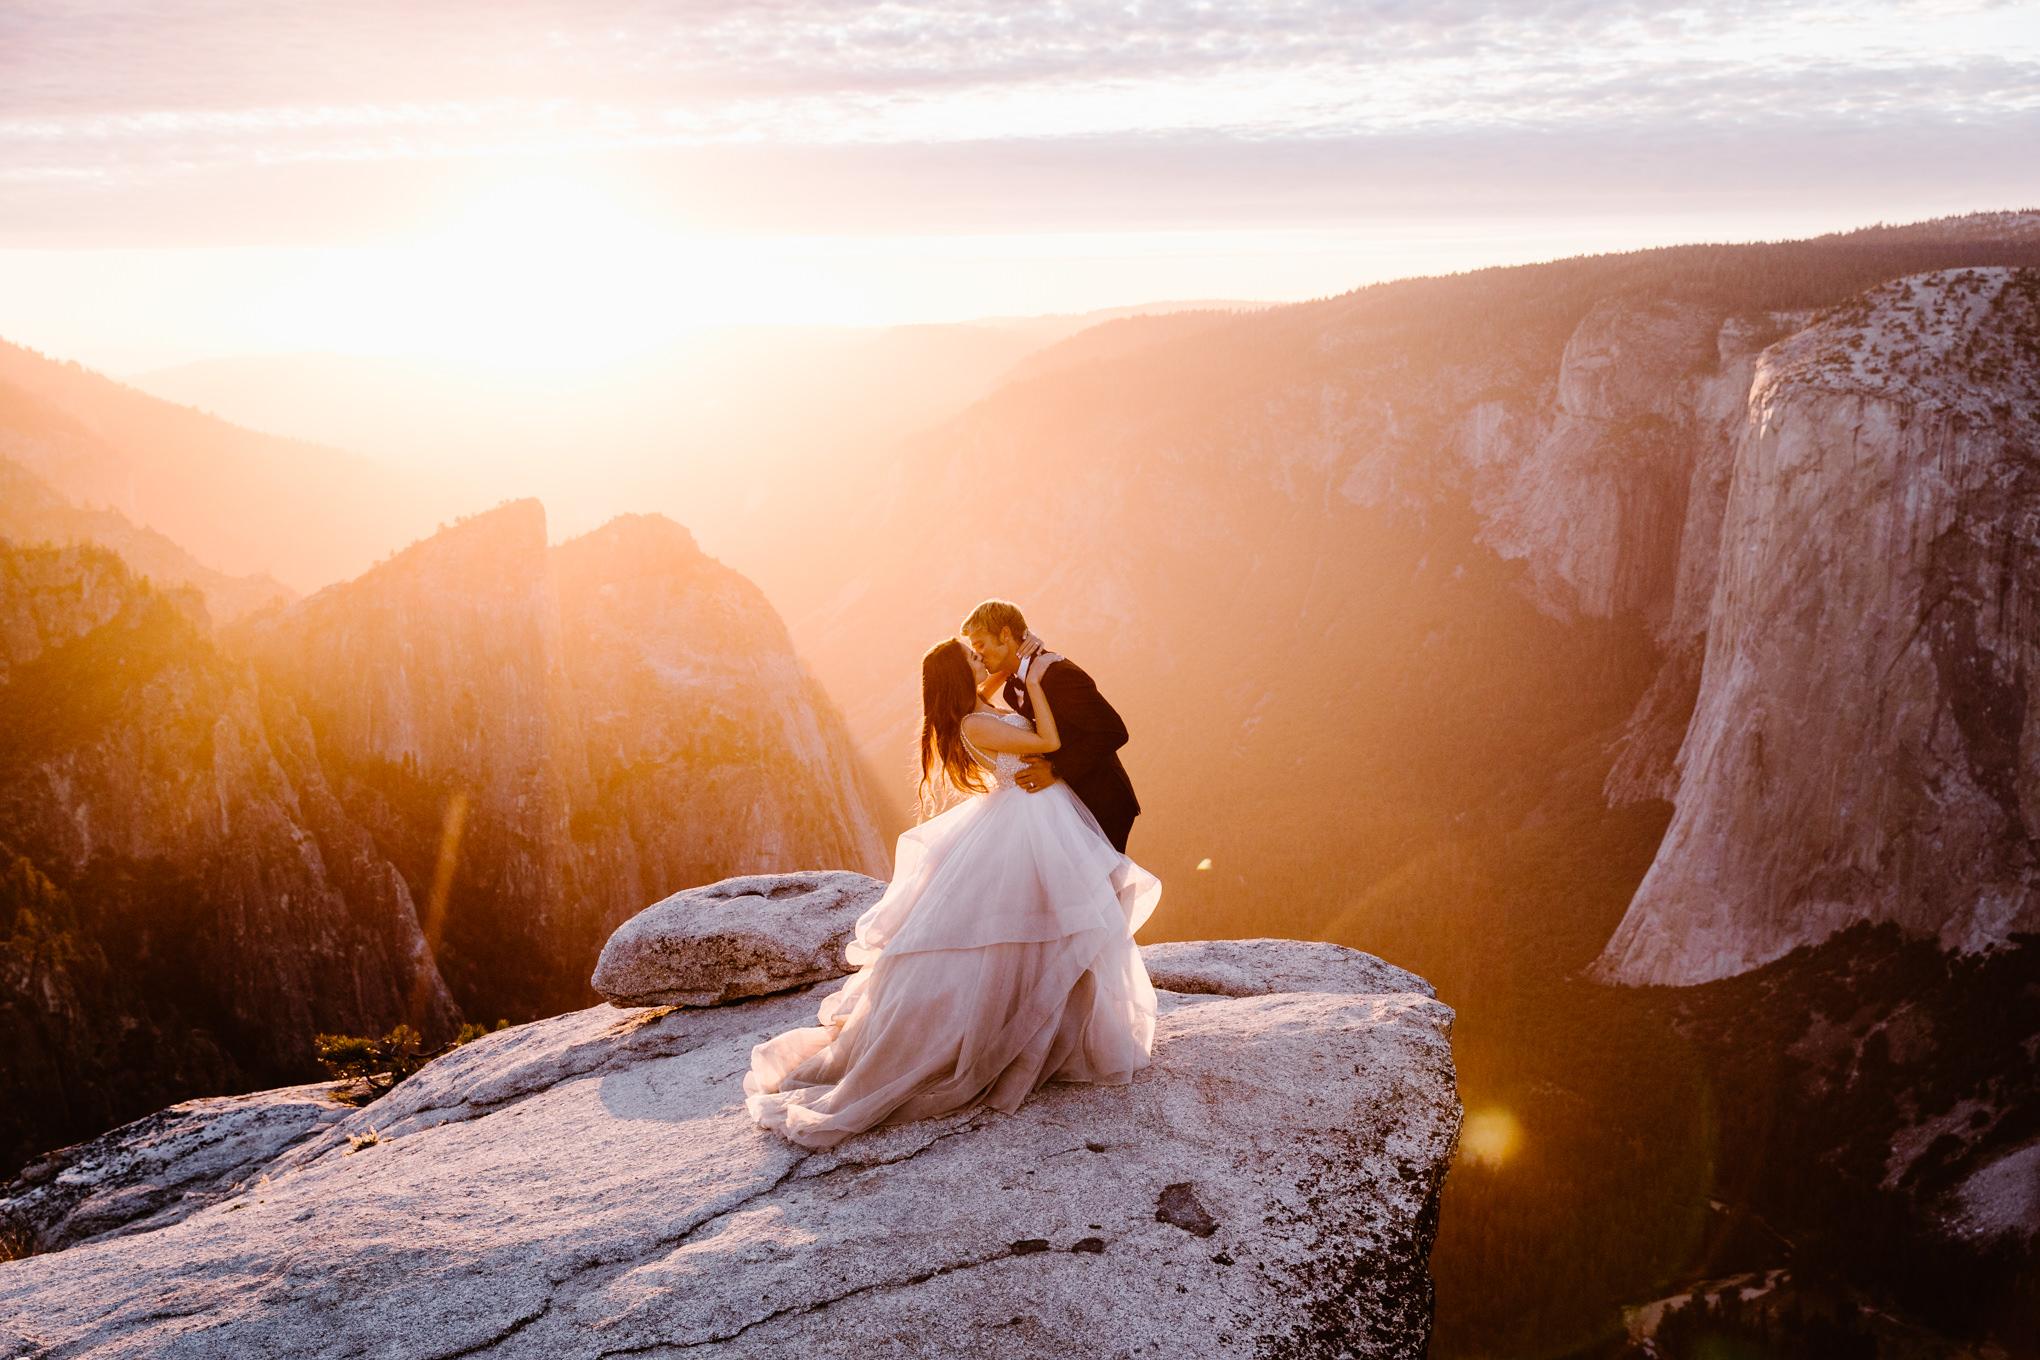 Taft-Point-Adventure-Elopement-Wedding-Photography-Yosemite-National-Park-13.jpg